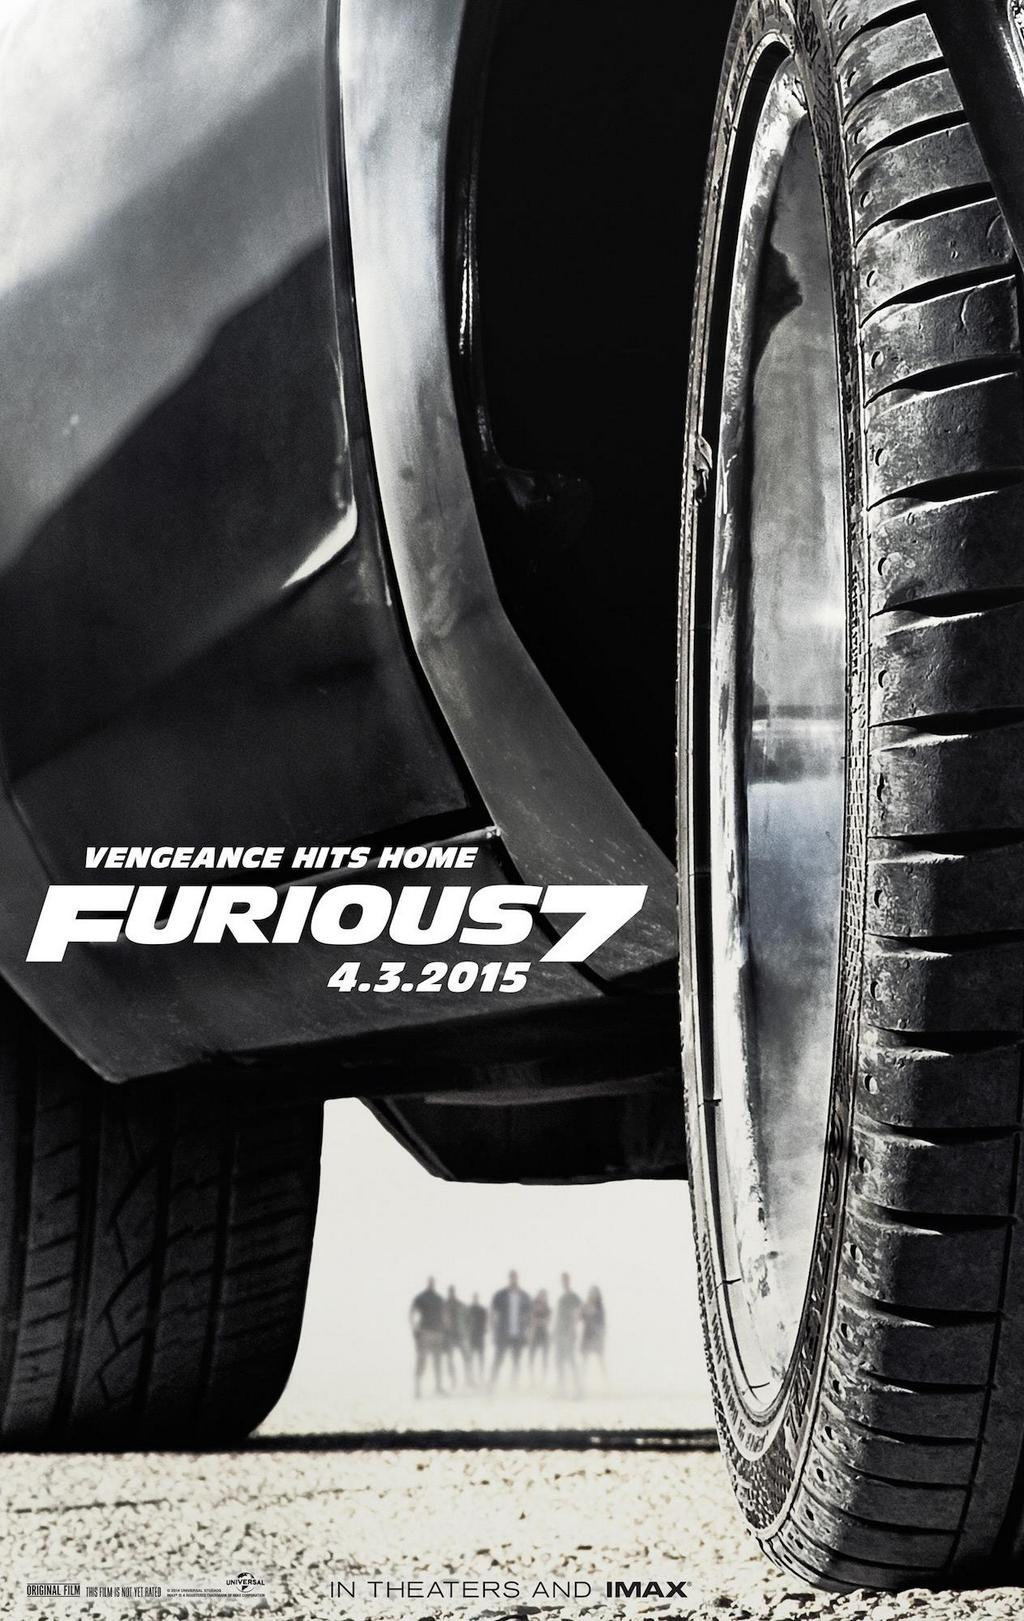 furious-7-movie-poster-lauren-blog.jpg